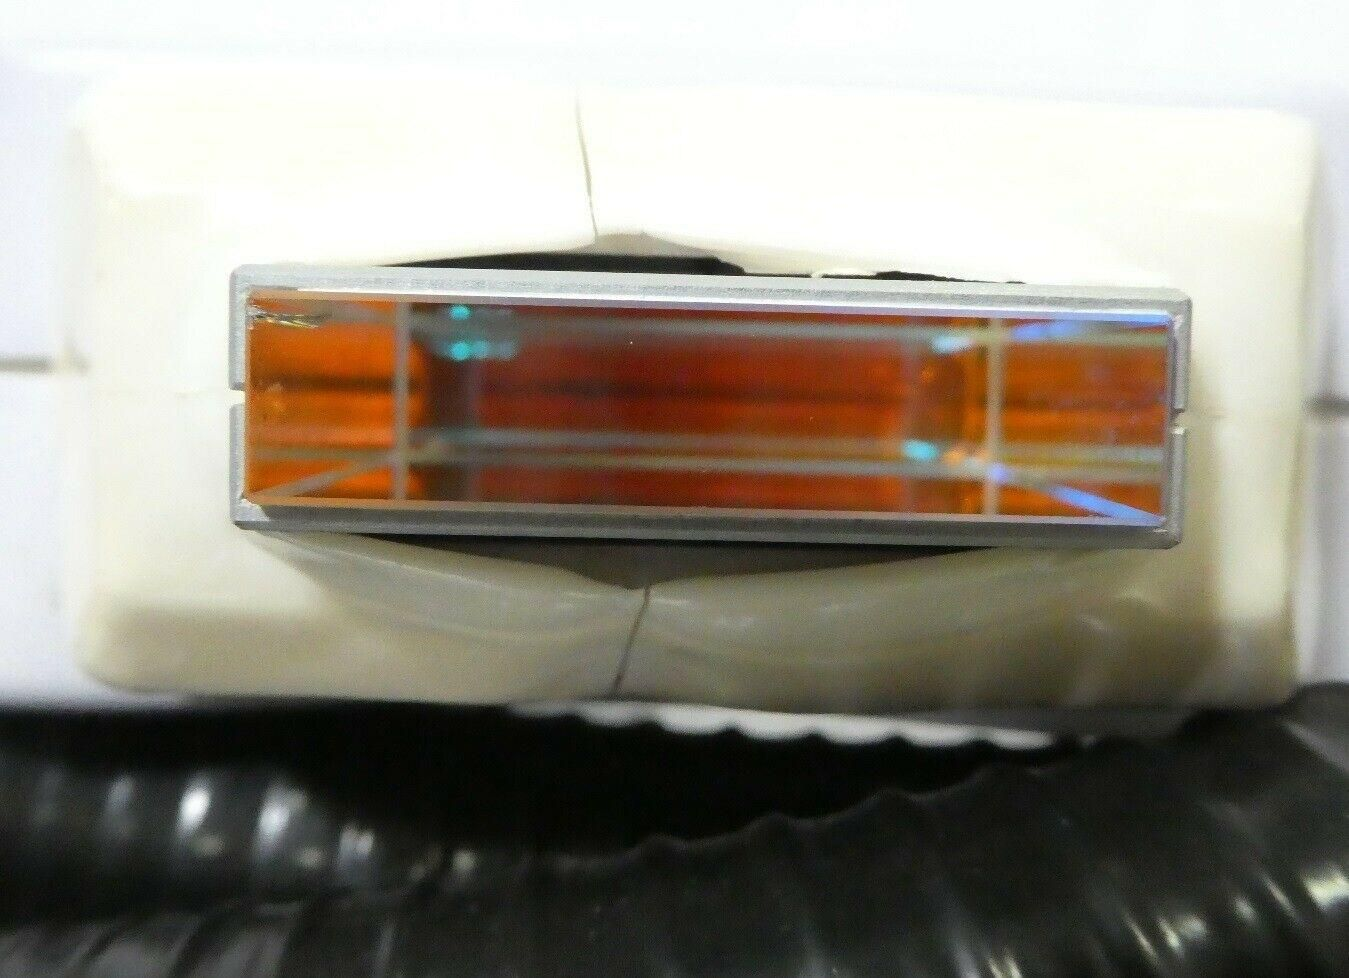 R159331 Lumenis IPL Quantum SR 560 N Laser Treatment Head SA362002-F SR560